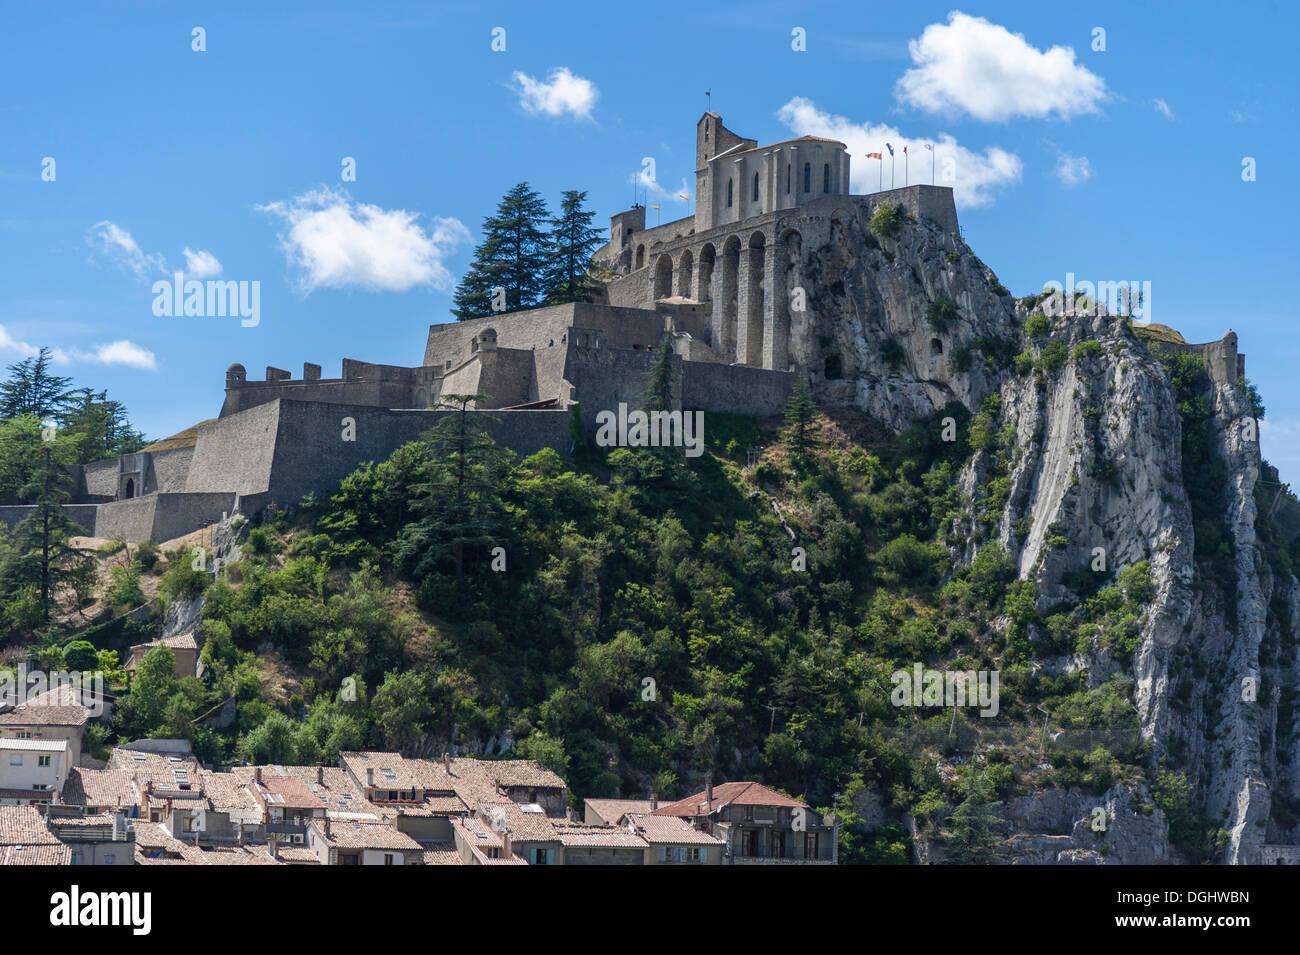 Citadel of Sisteron, Provence-Alpes-Côte d'Azur, France, Europe - Stock Image